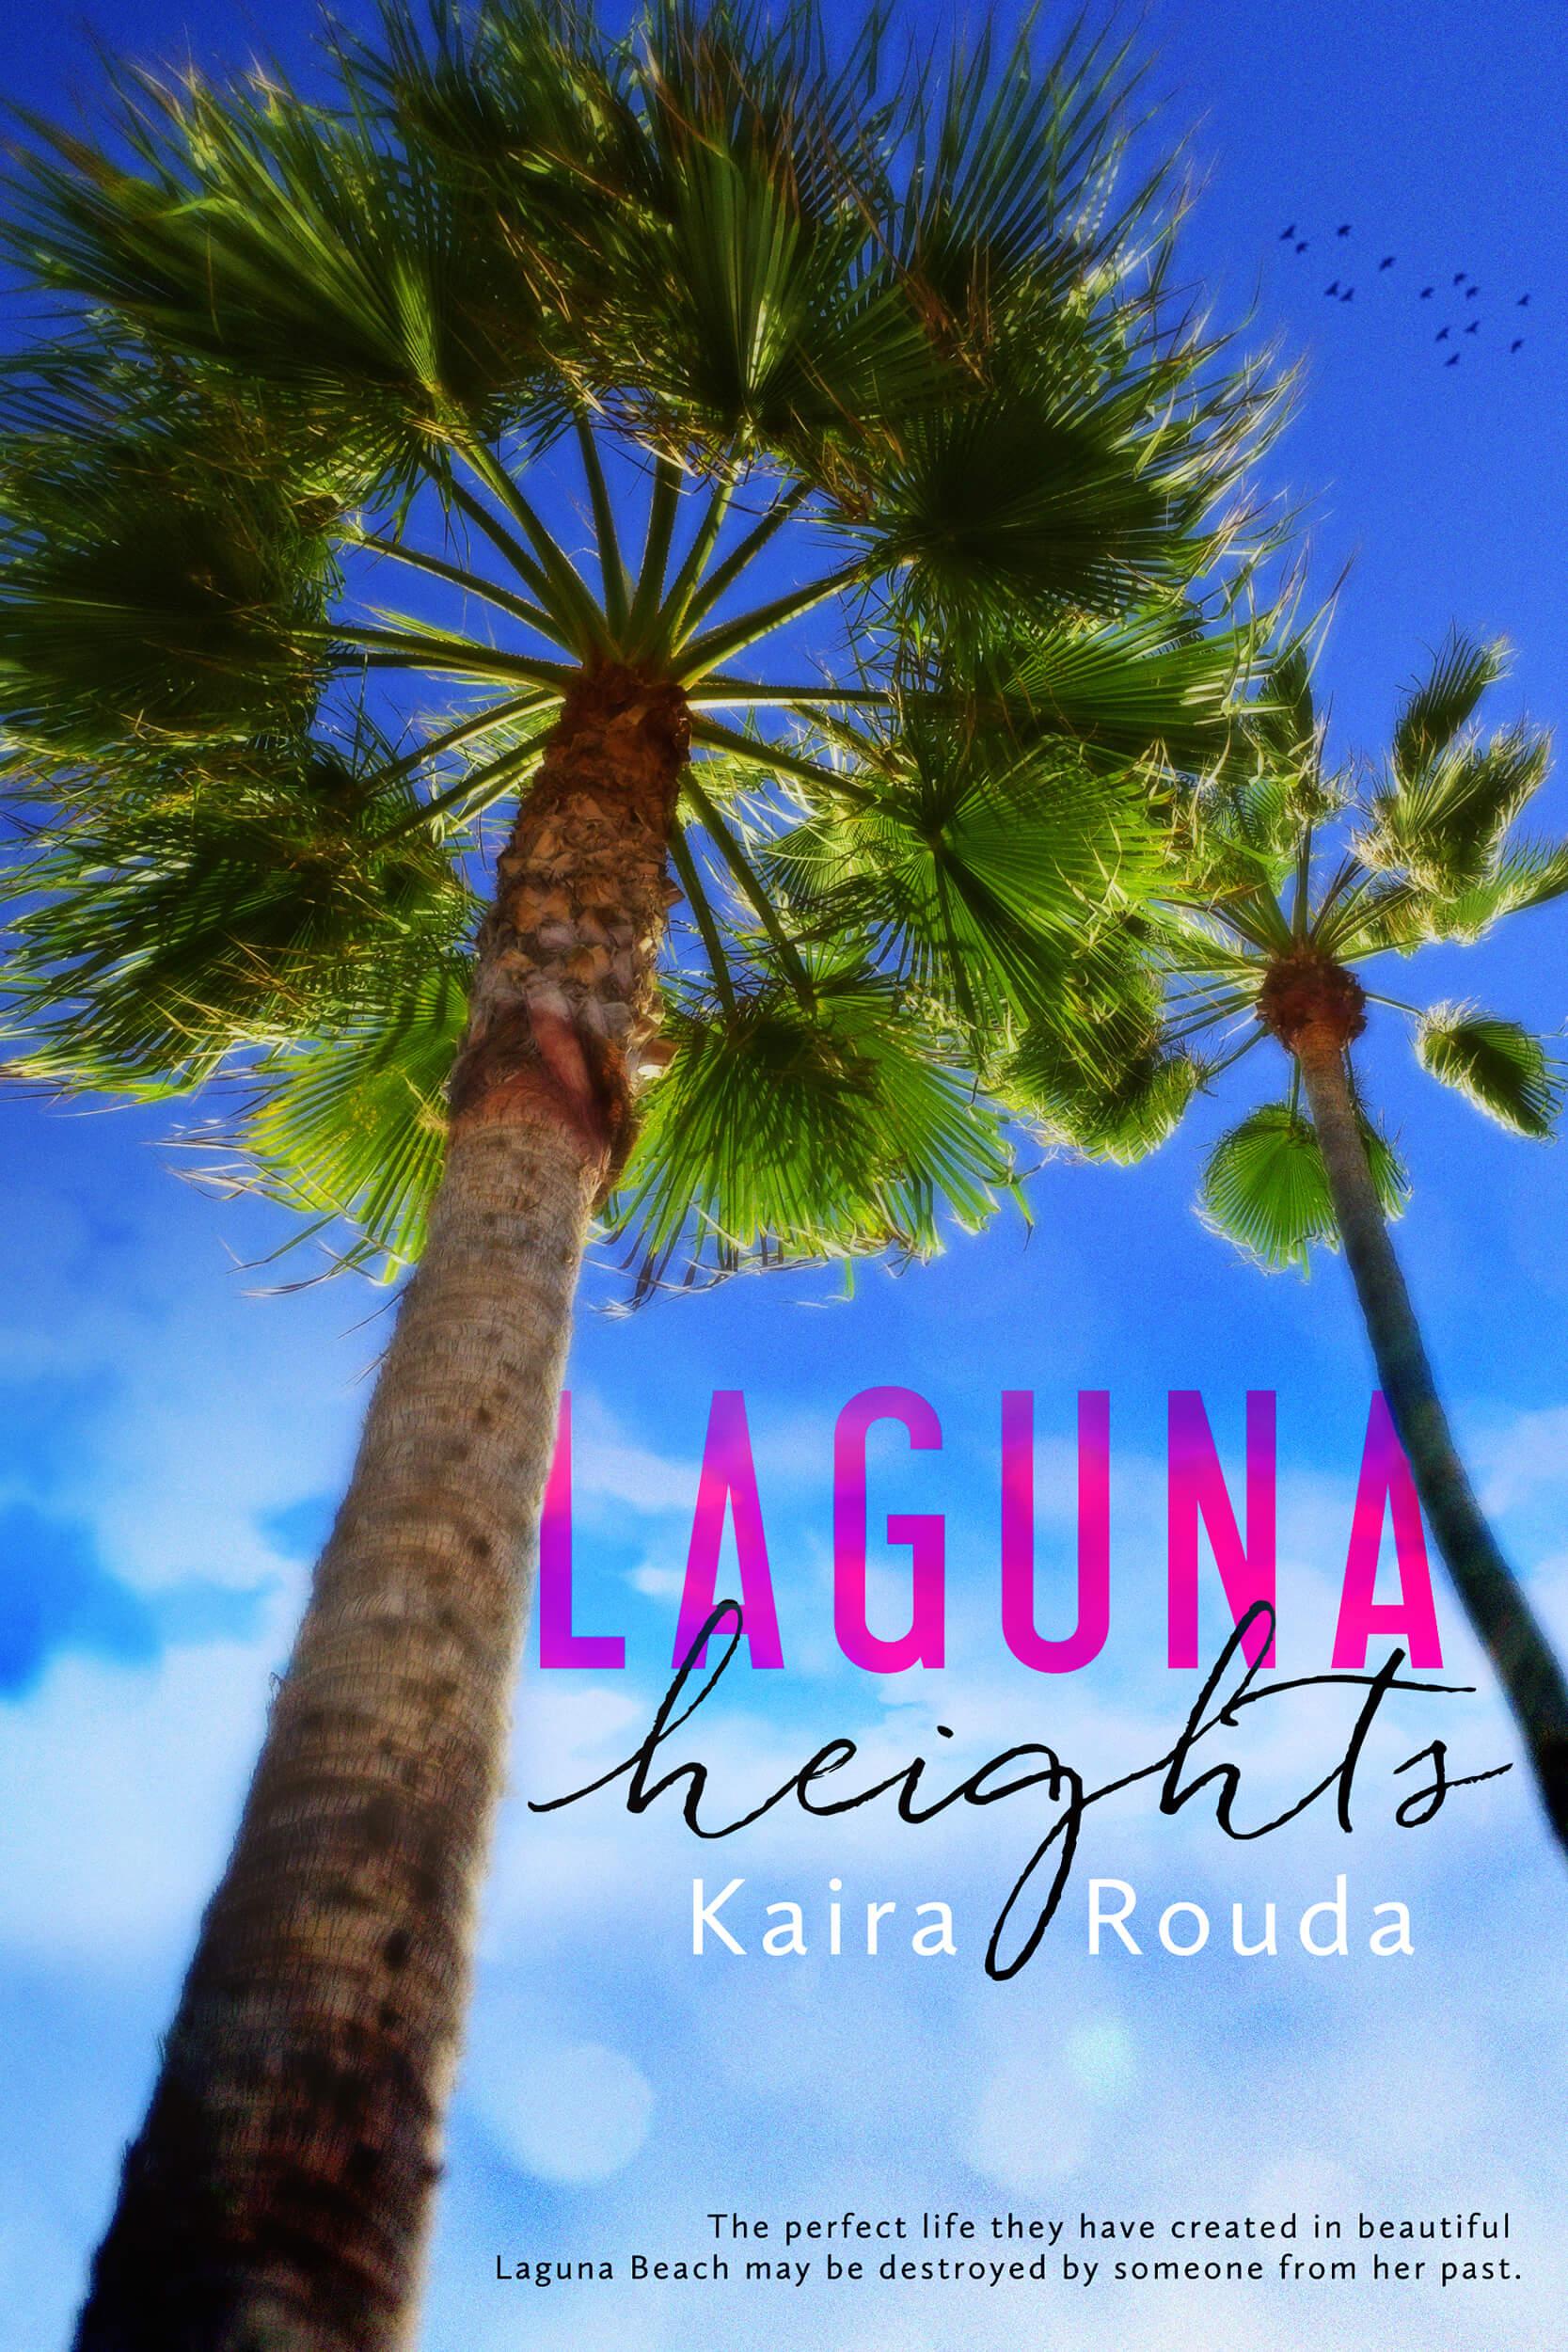 Laguna Heights